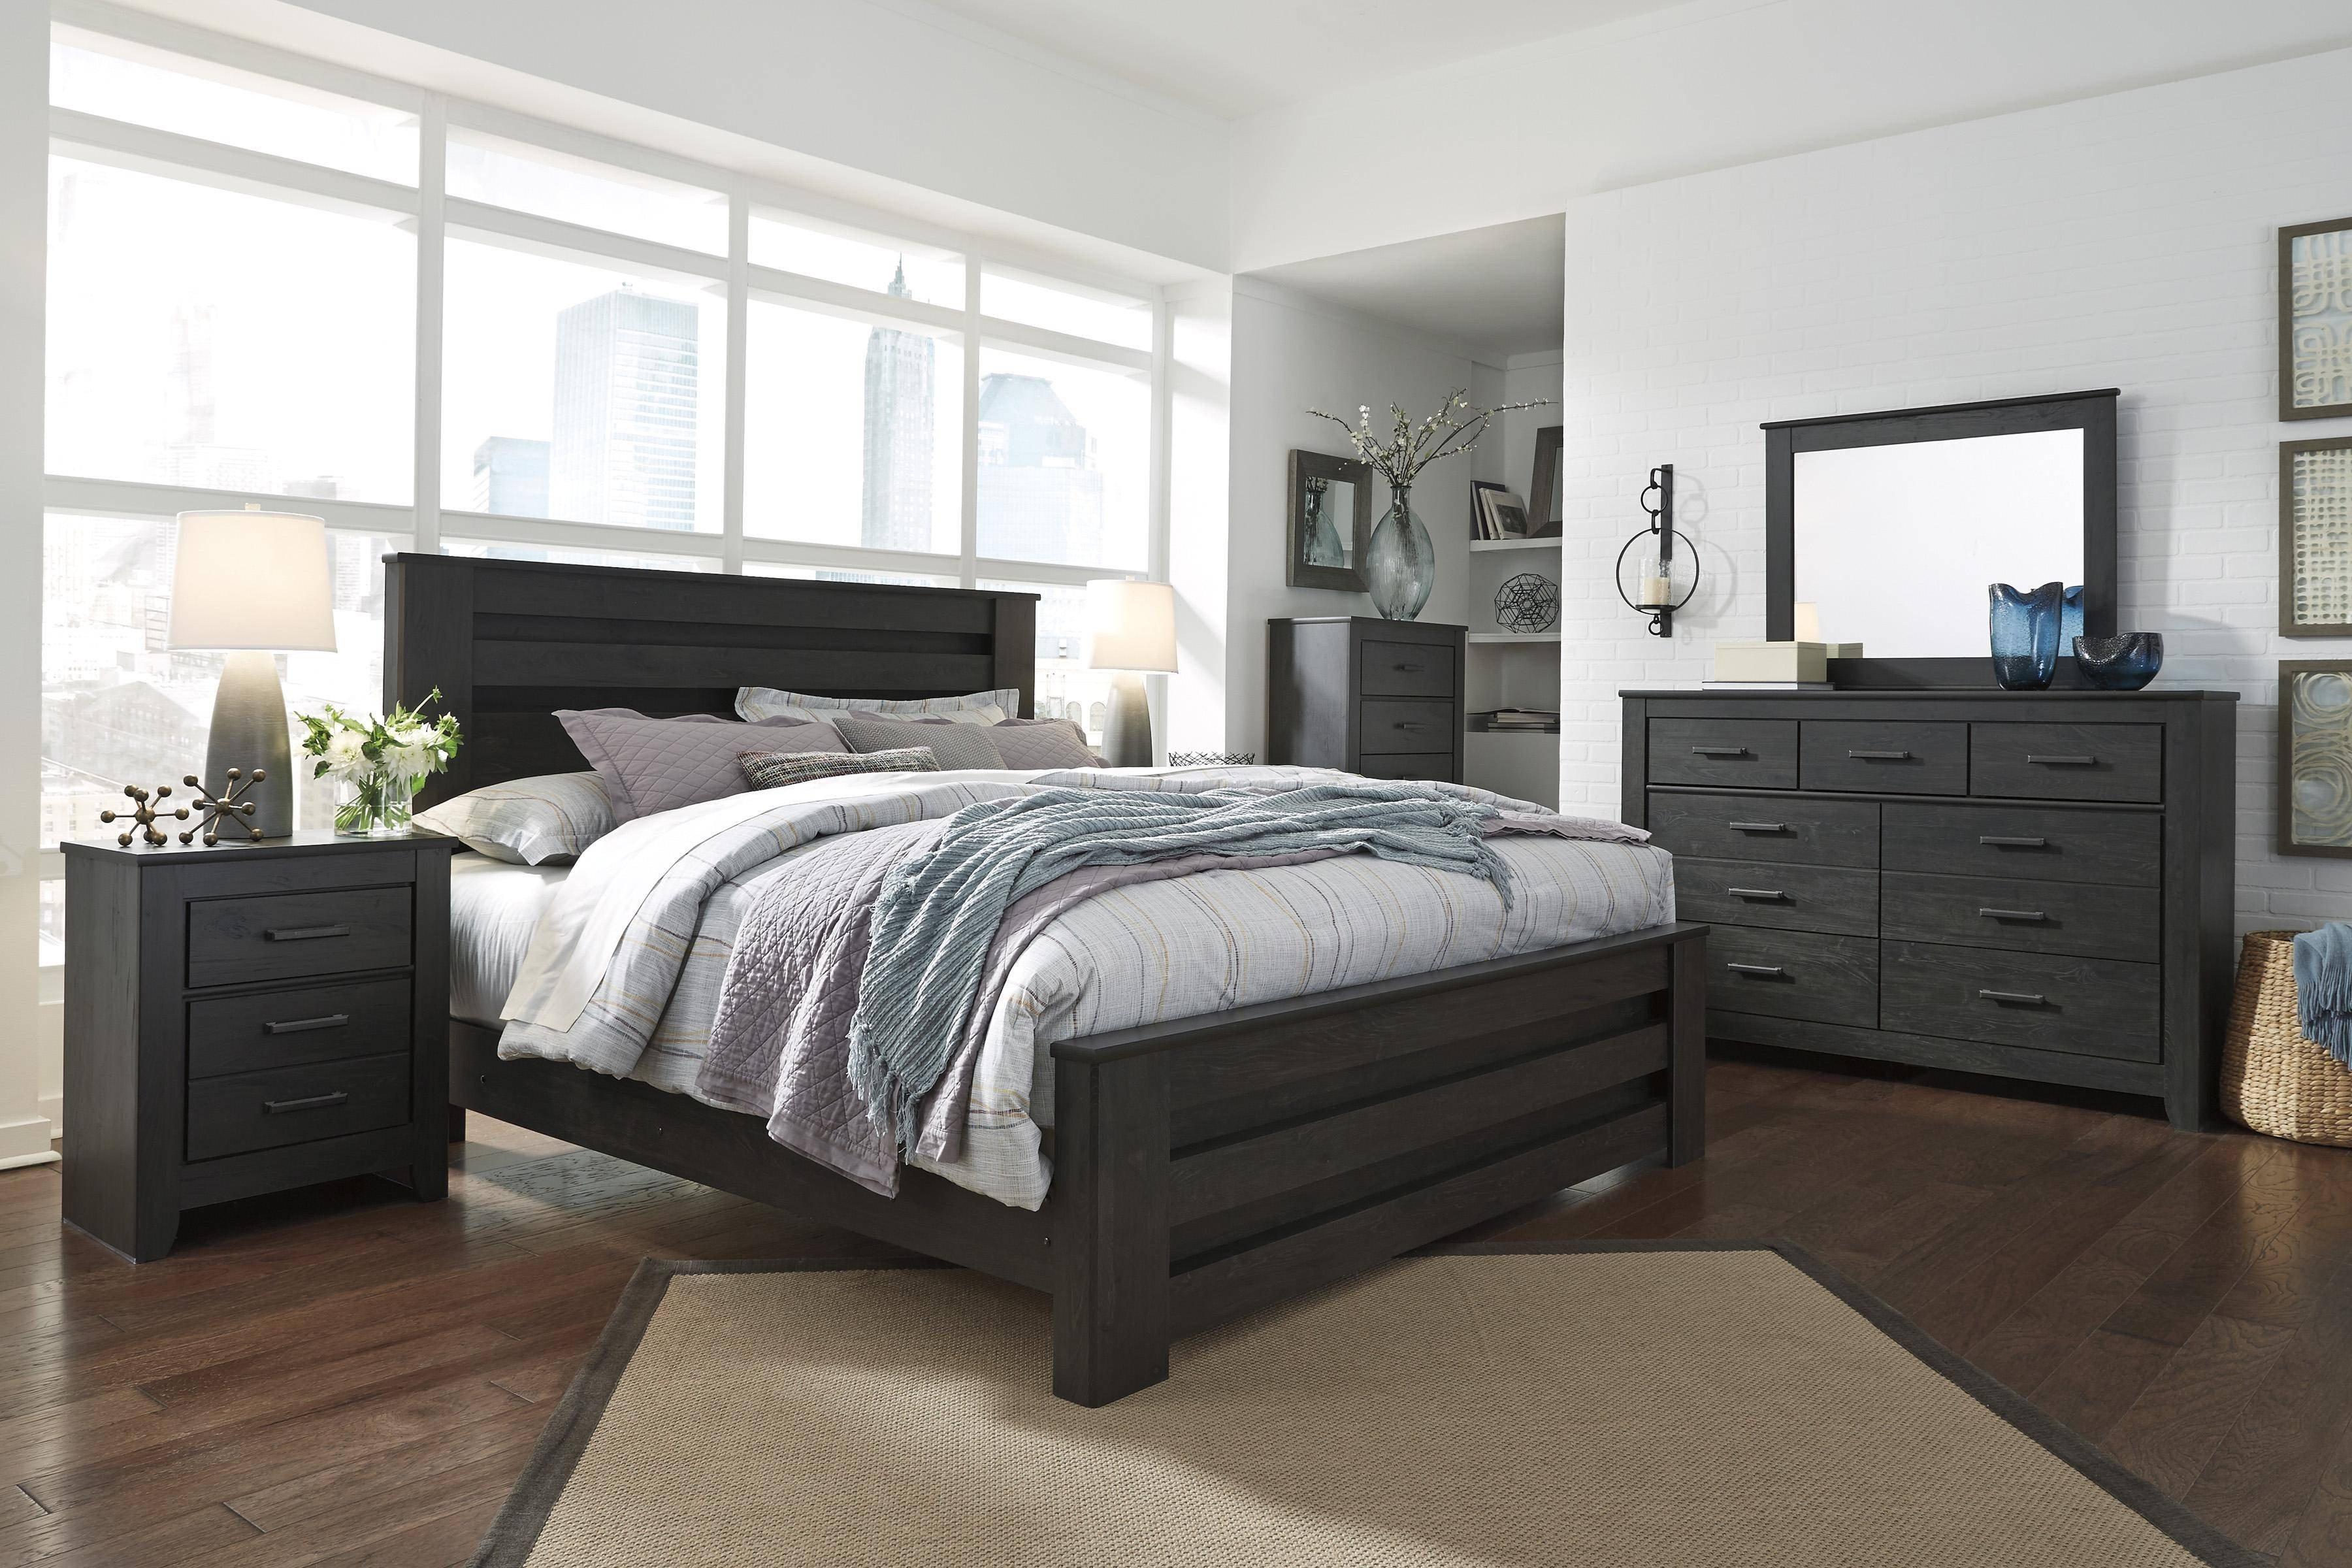 Ashley Furniture Silver Bedroom Set Beautiful ashley Brinxton B249 King Size Platform Bedroom Set 5pcs In